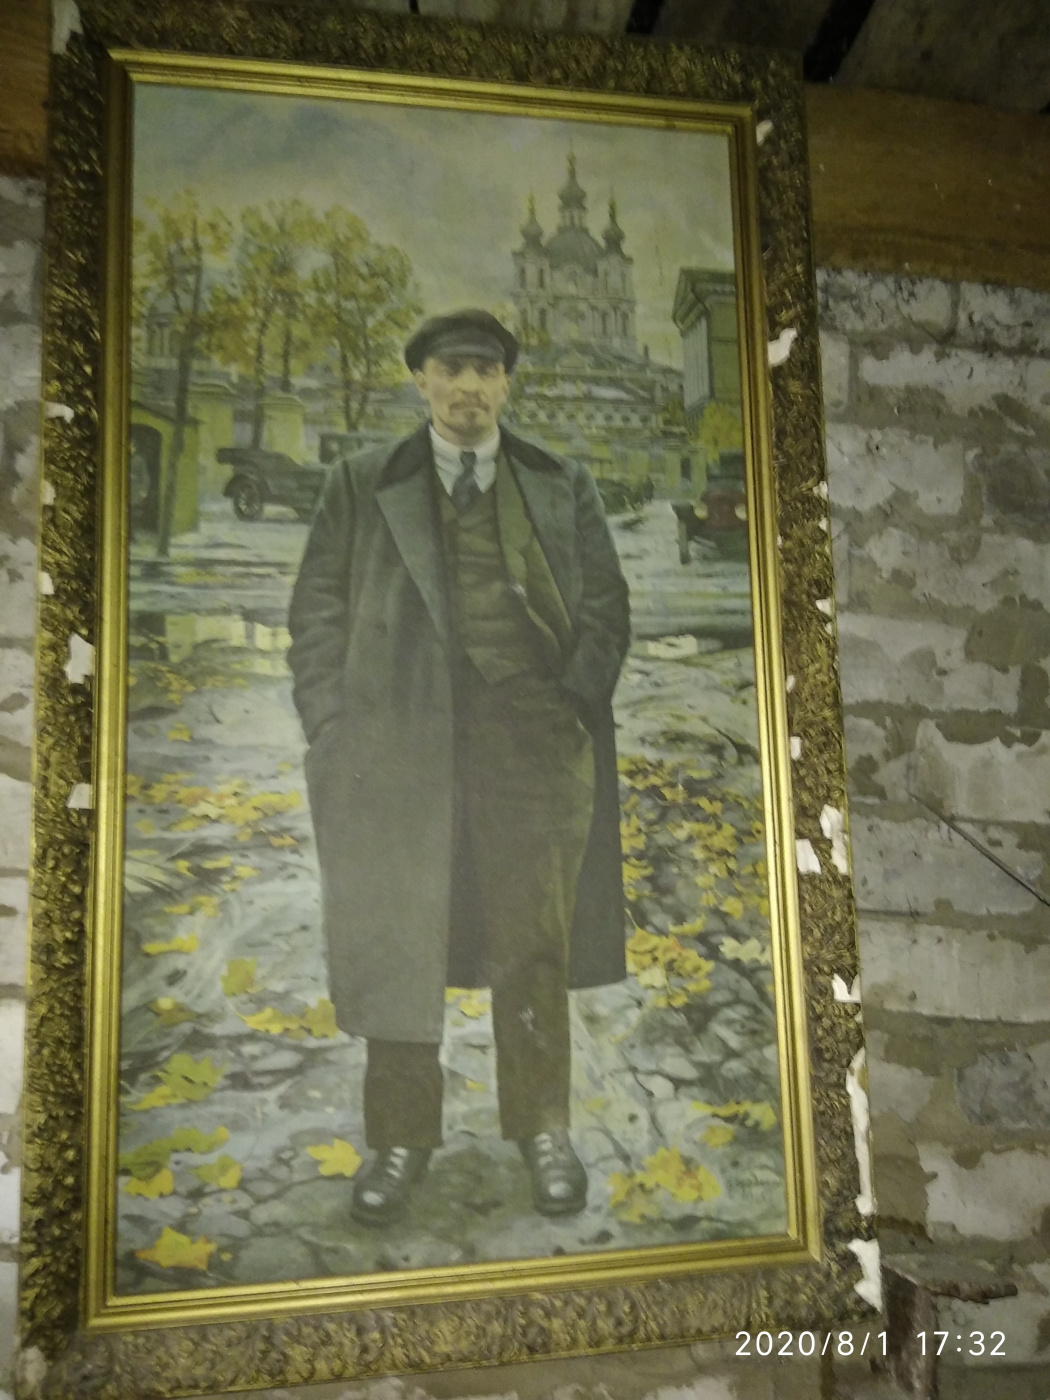 Brodsky. Lenin against the background of Smolny